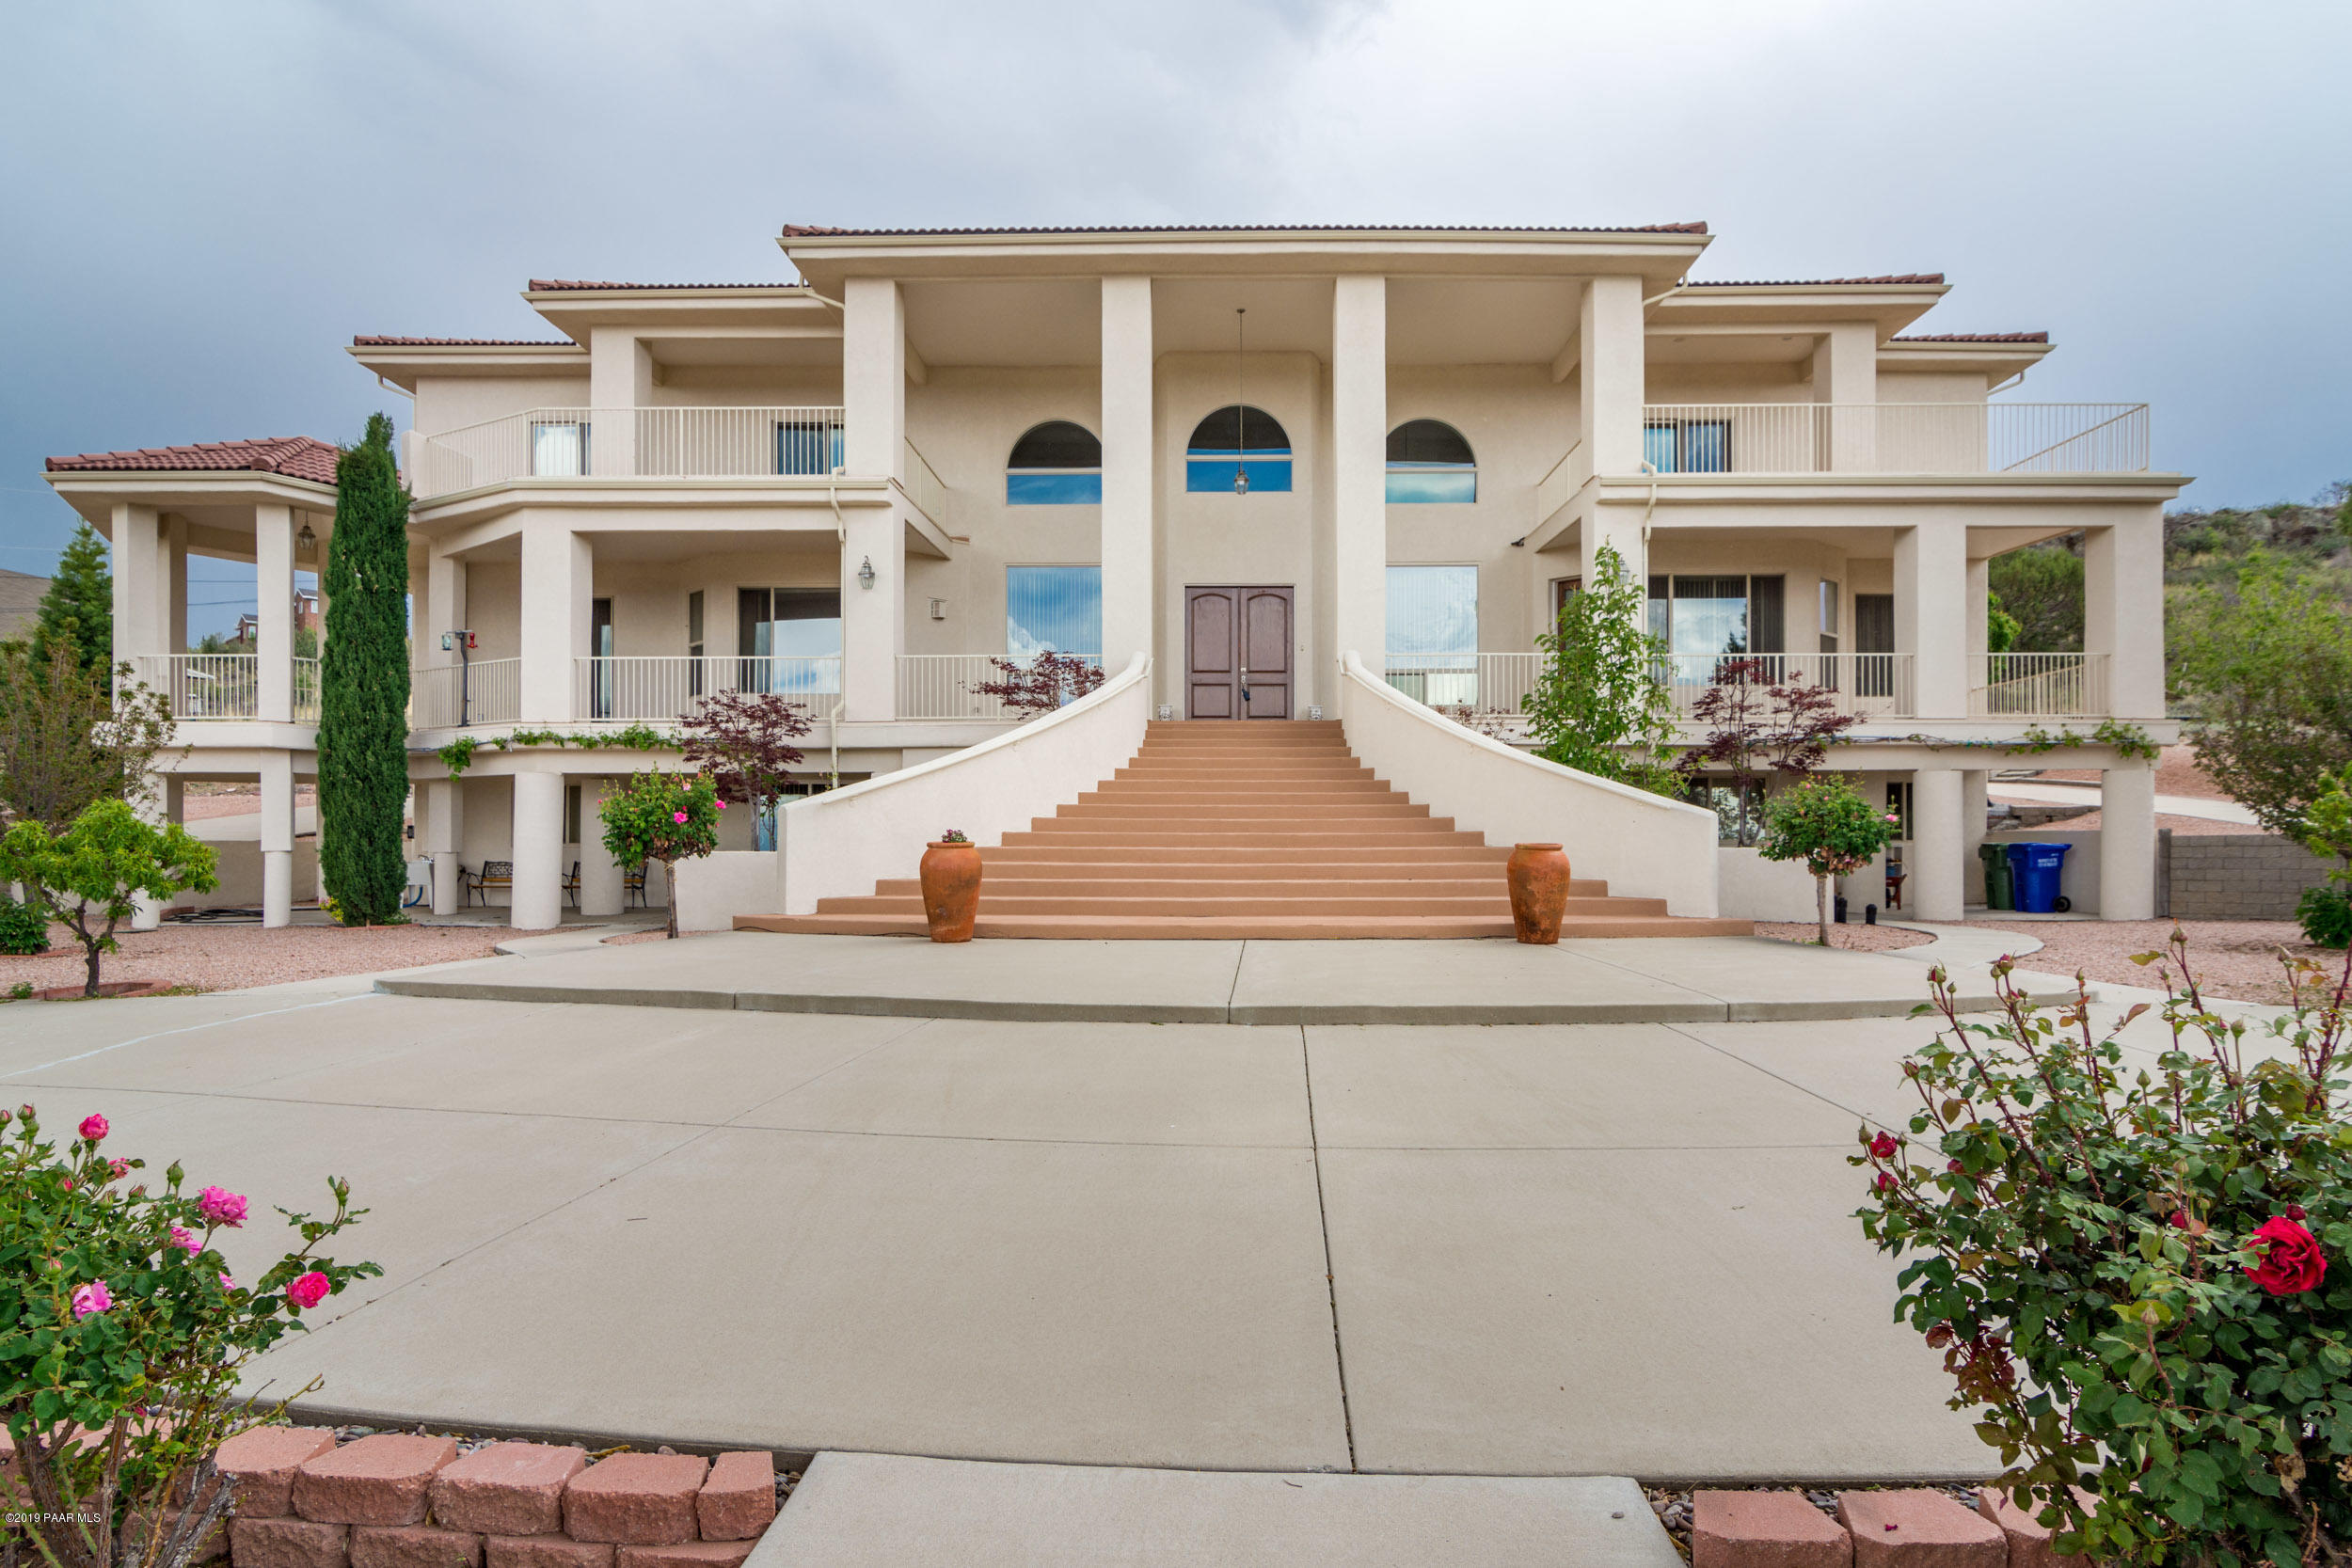 Photo of 699 Lakeview, Prescott, AZ 86301